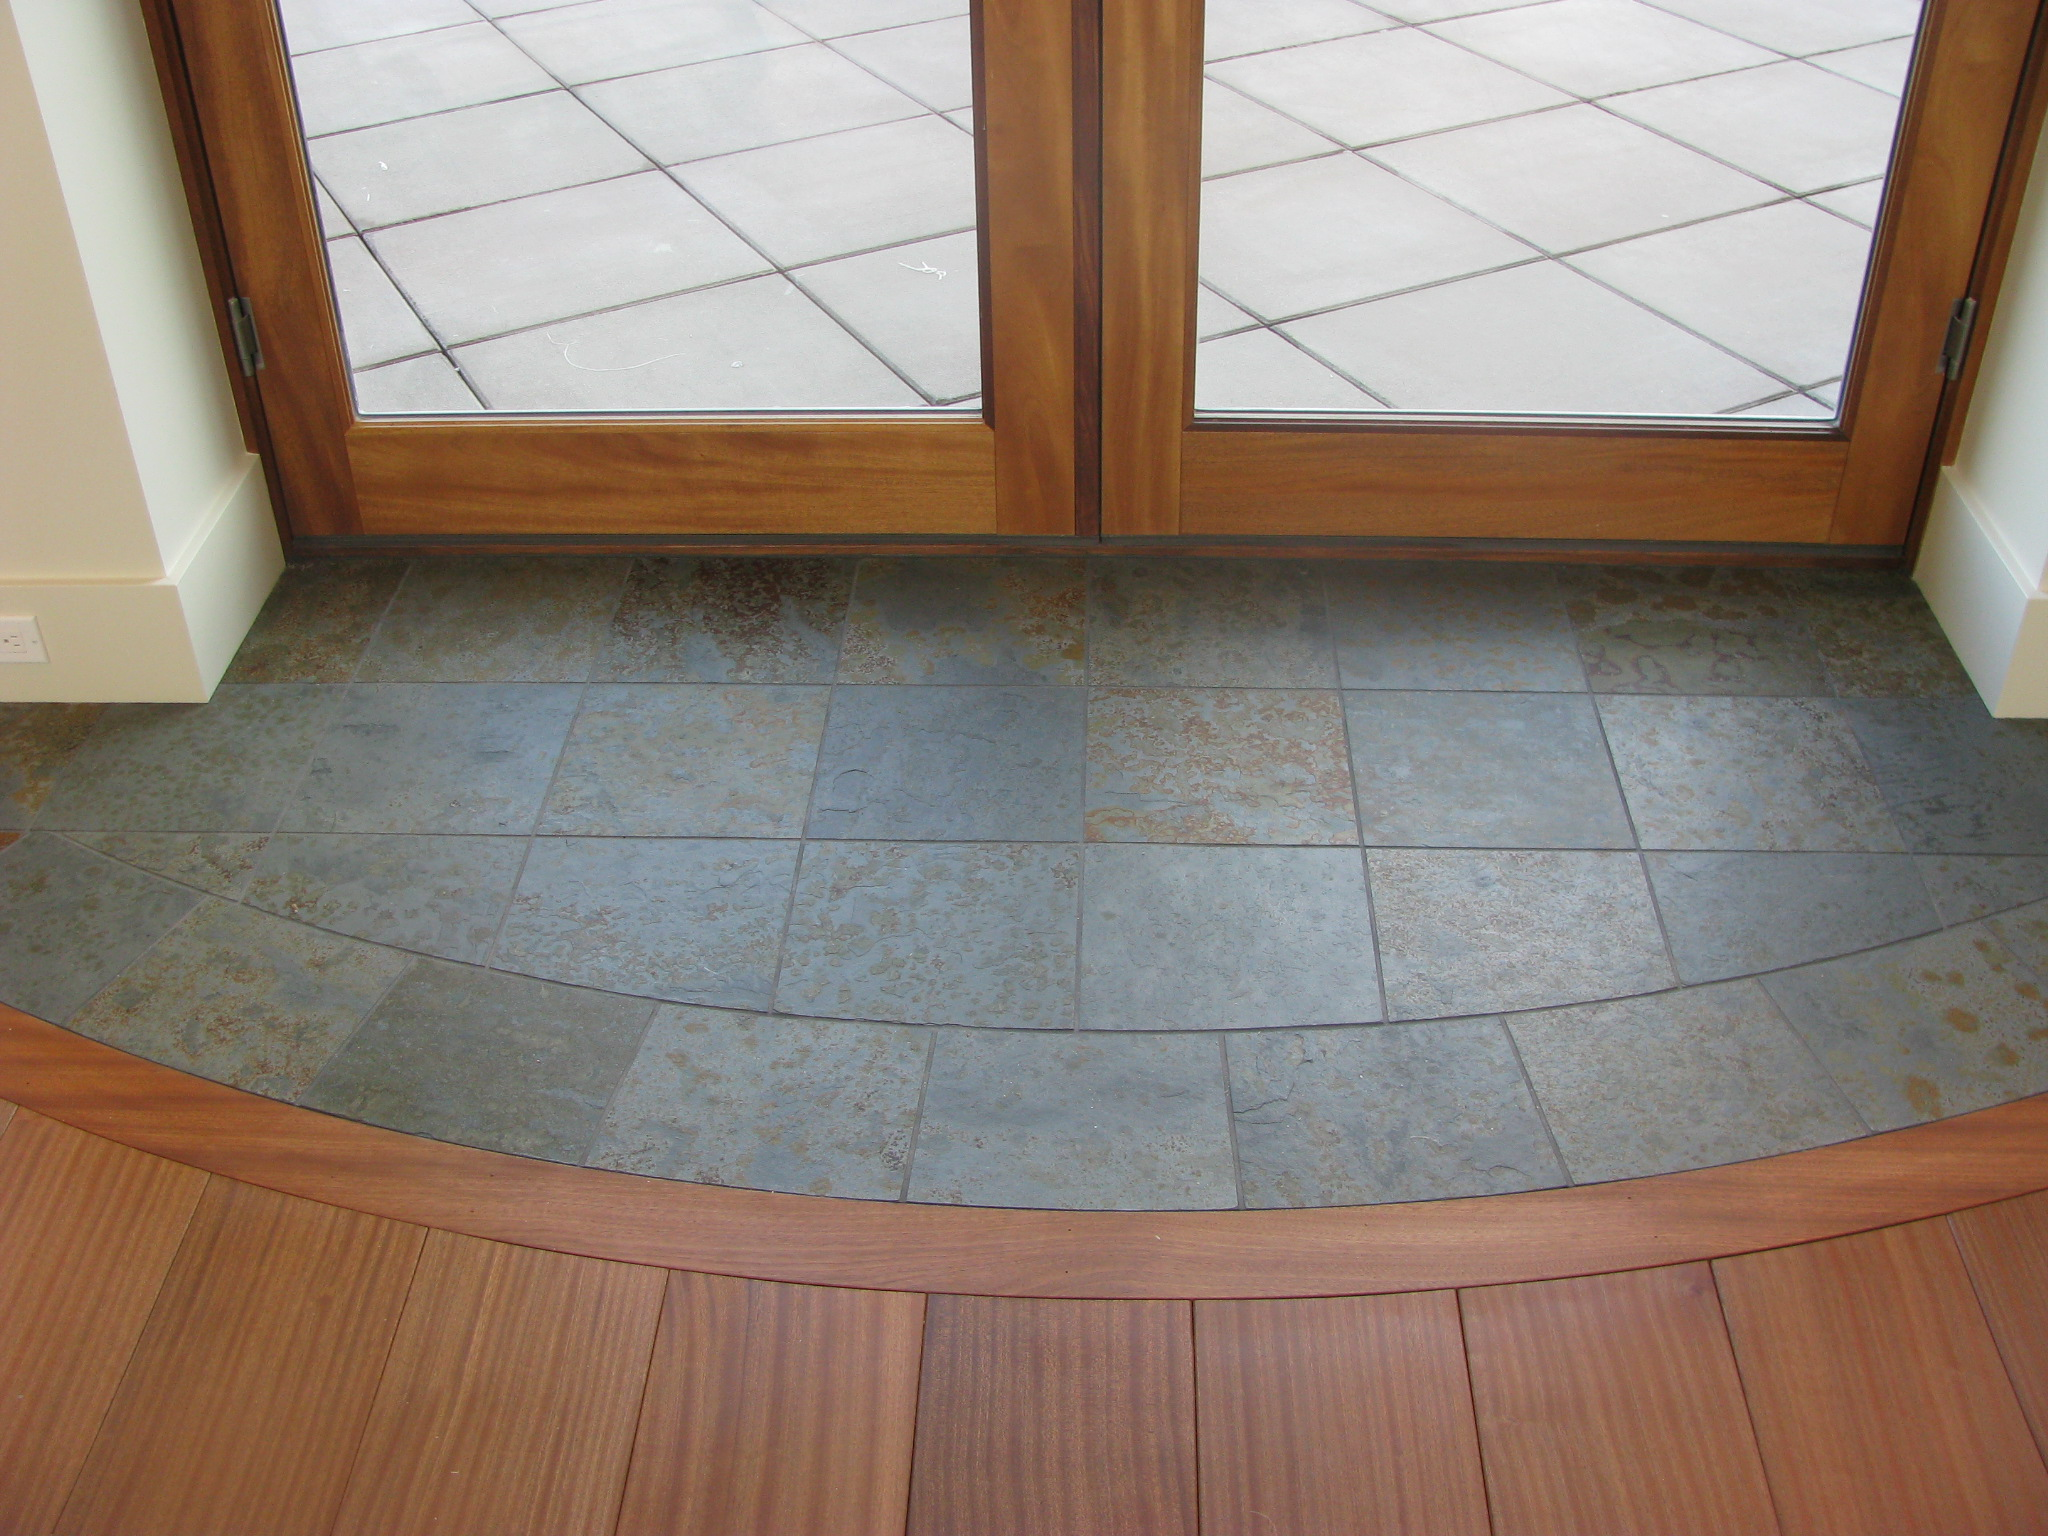 Fabulous Tile Entryway Home Ideas 2016 Largest Home Design Picture Inspirations Pitcheantrous